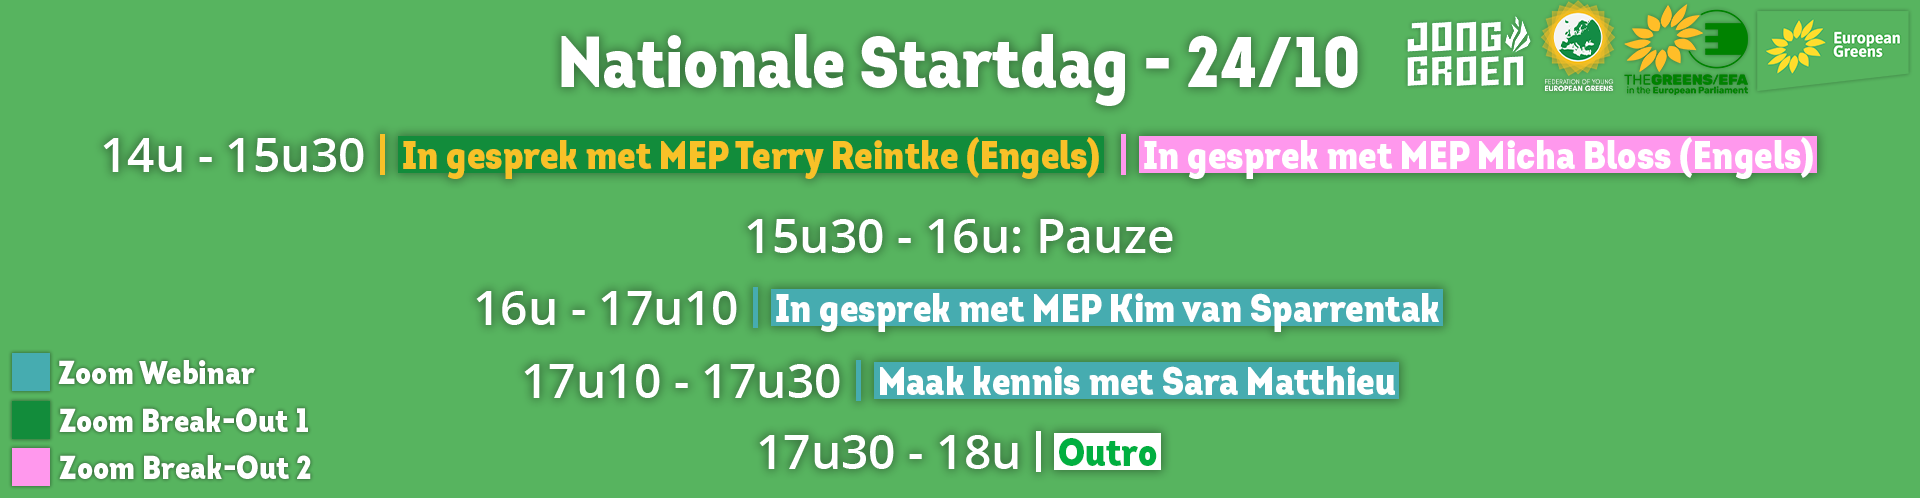 startdag_agenda_nm.png